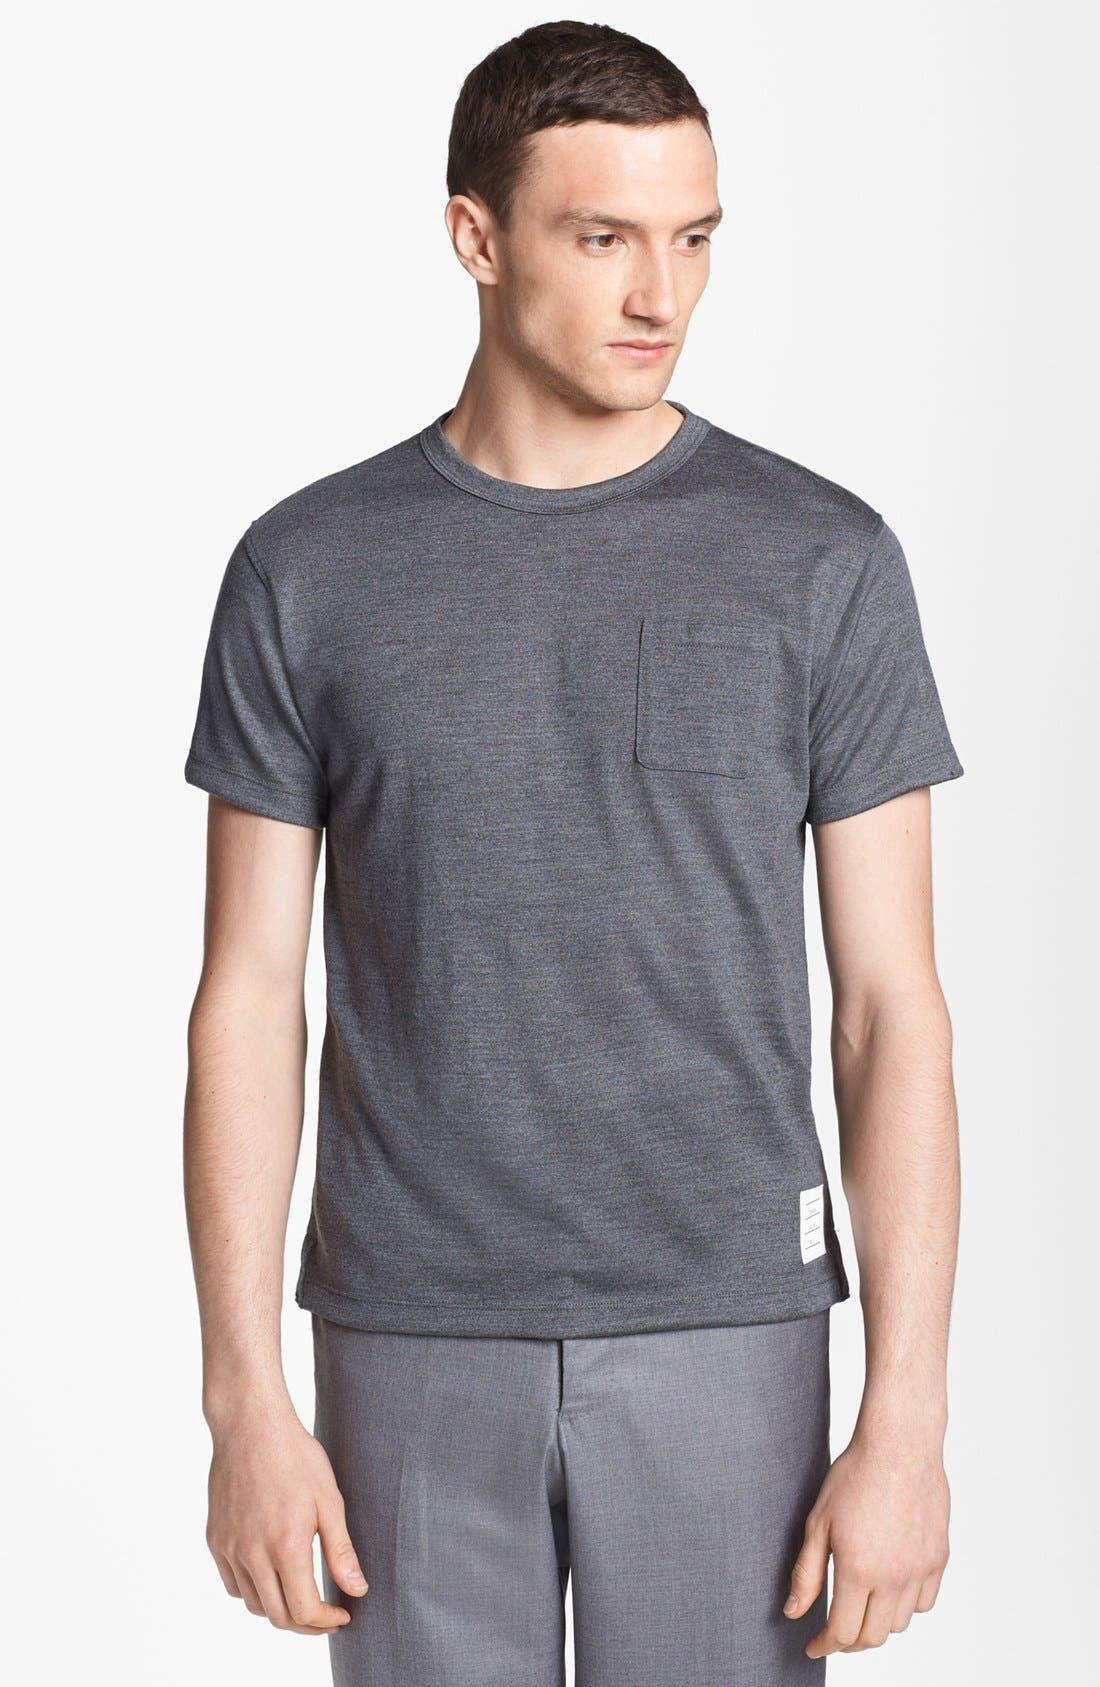 Main Image - Thom Browne Merino Wool Pocket T-Shirt